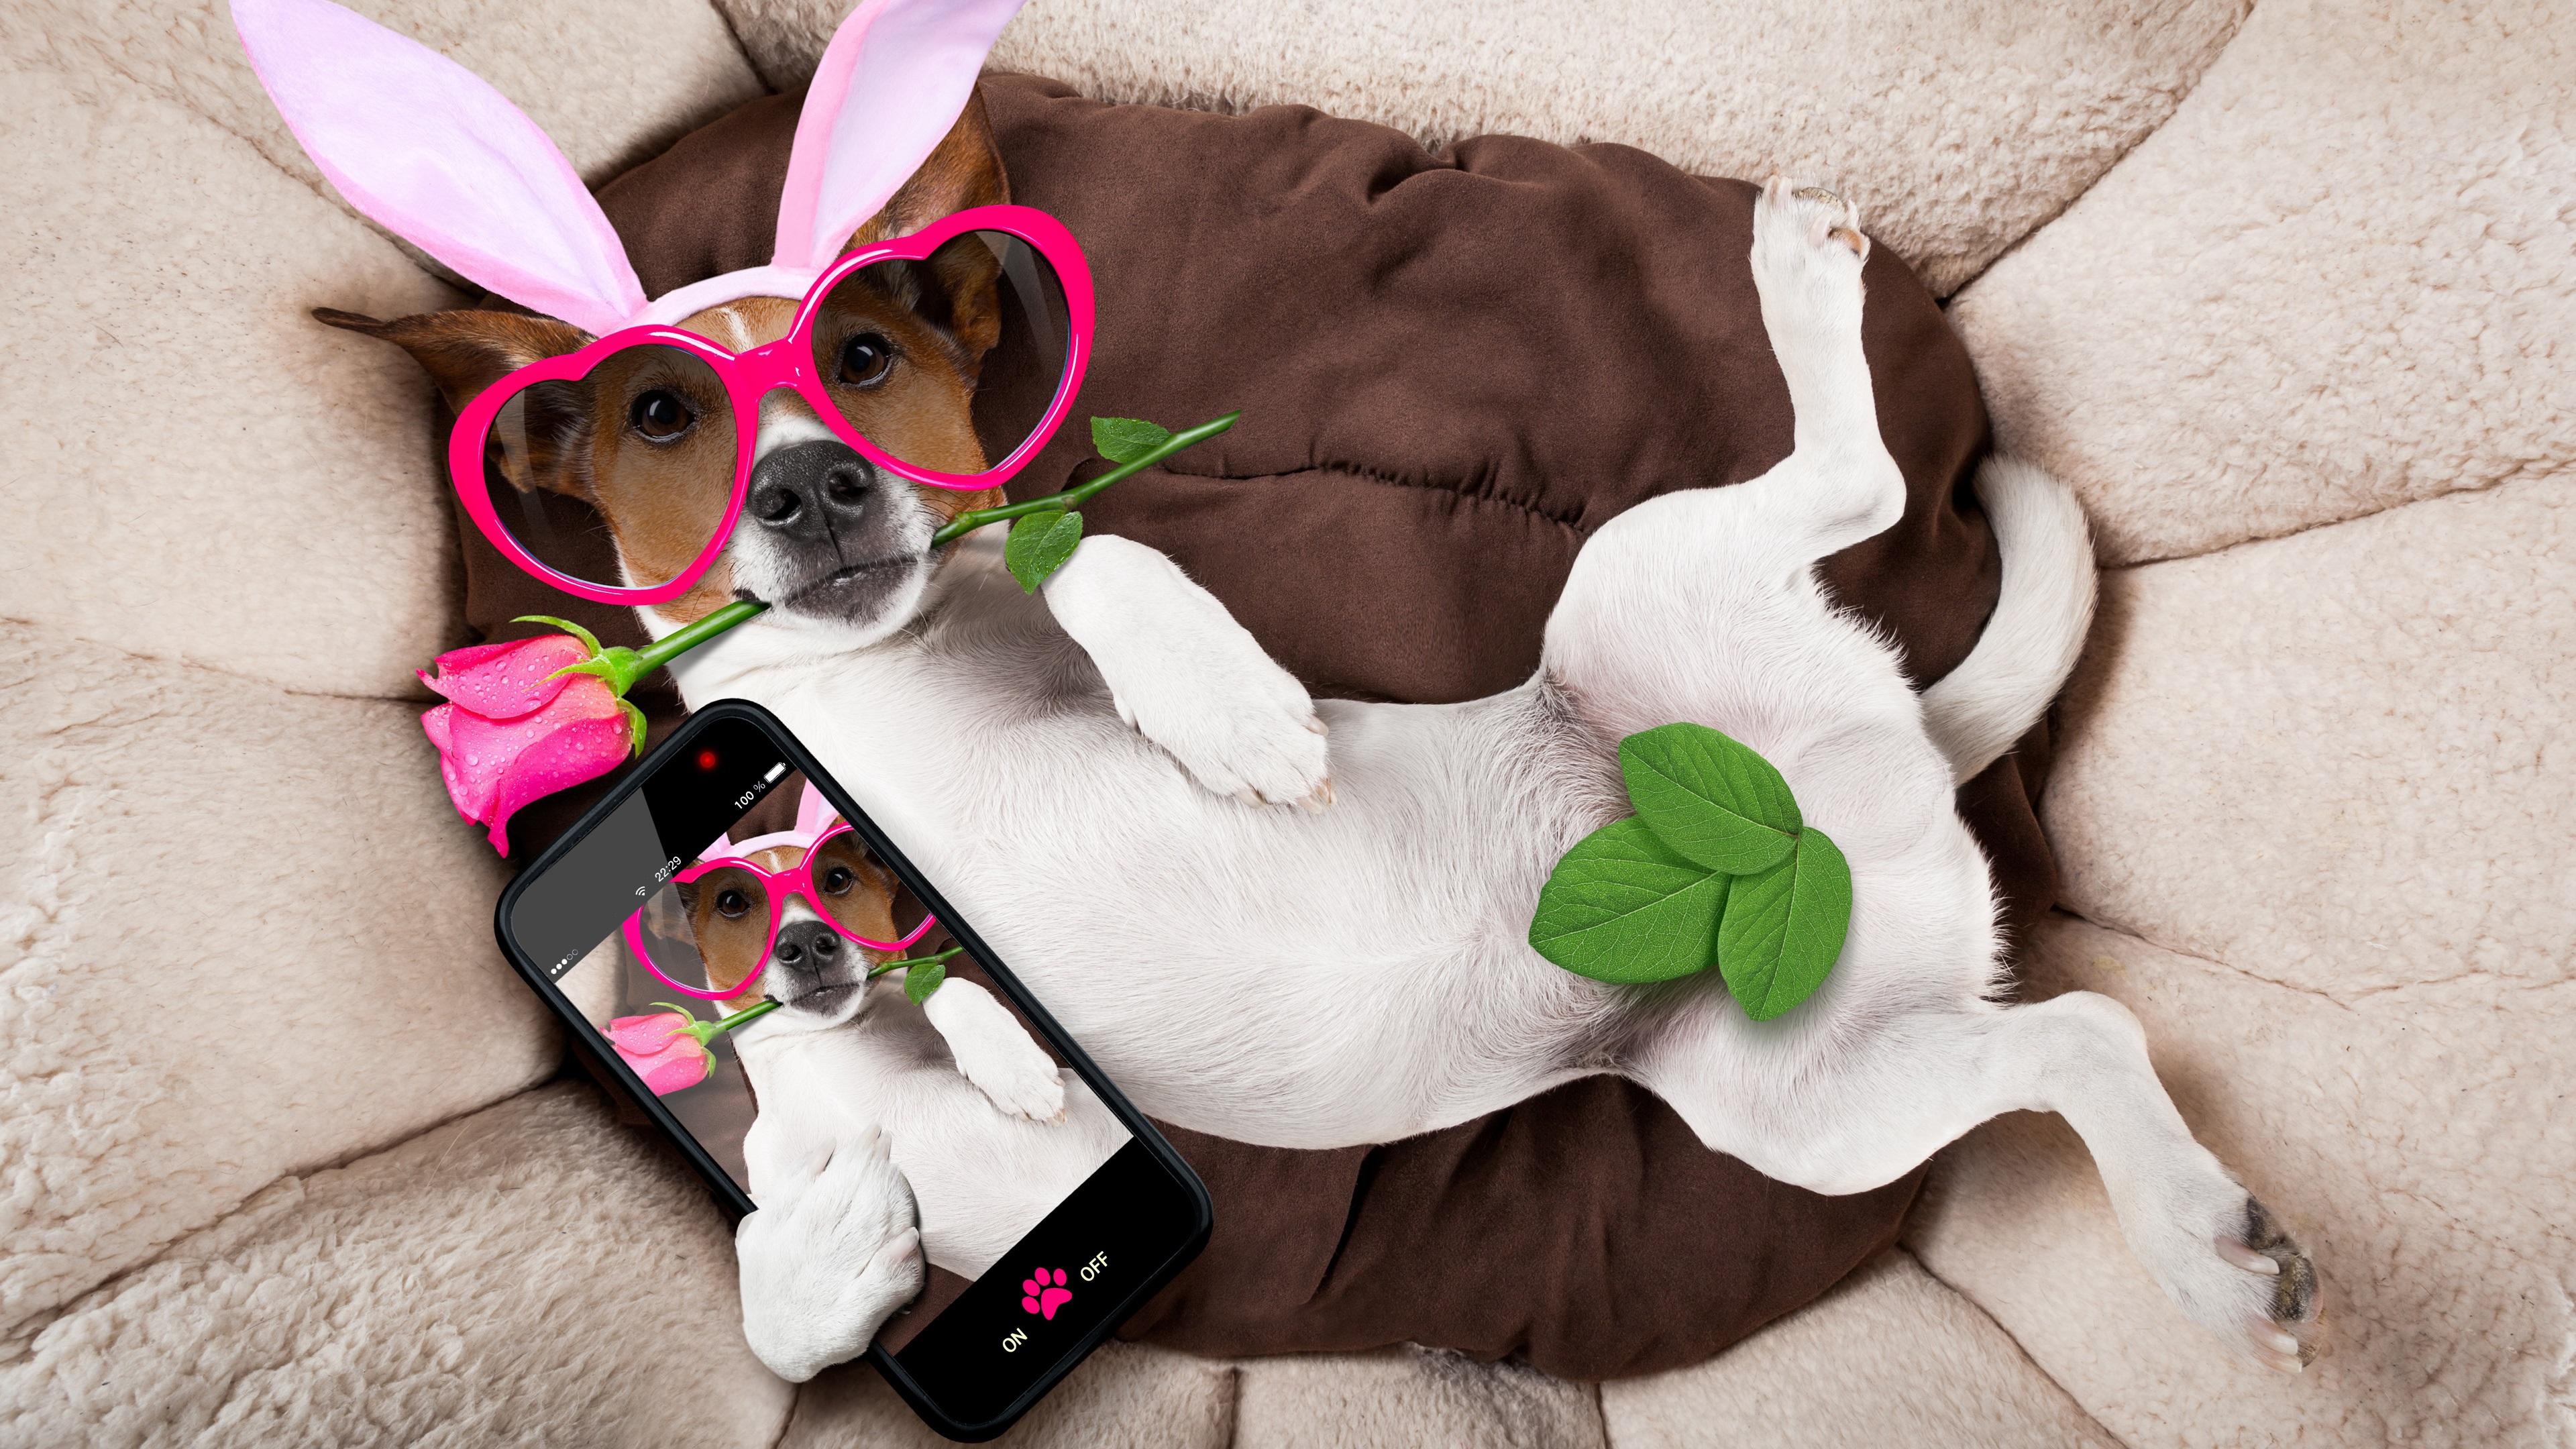 щенок с кроликом онлайн